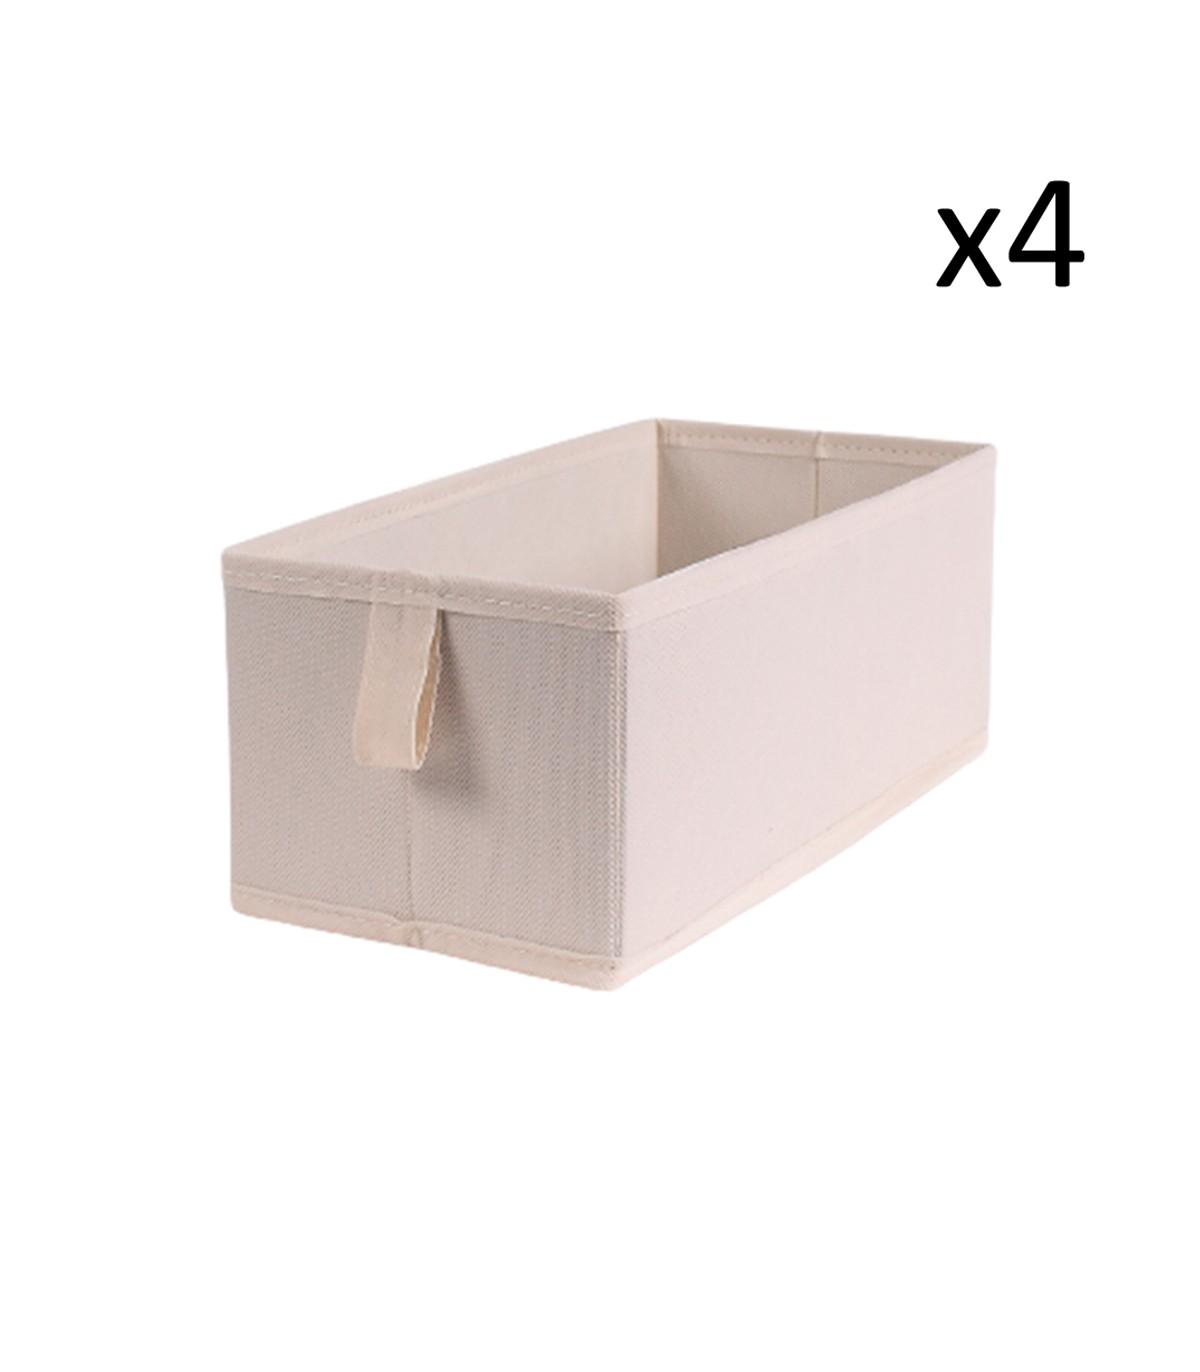 Lot de 4 tiroirs pliables intissés 28x14x11cm - Blanc